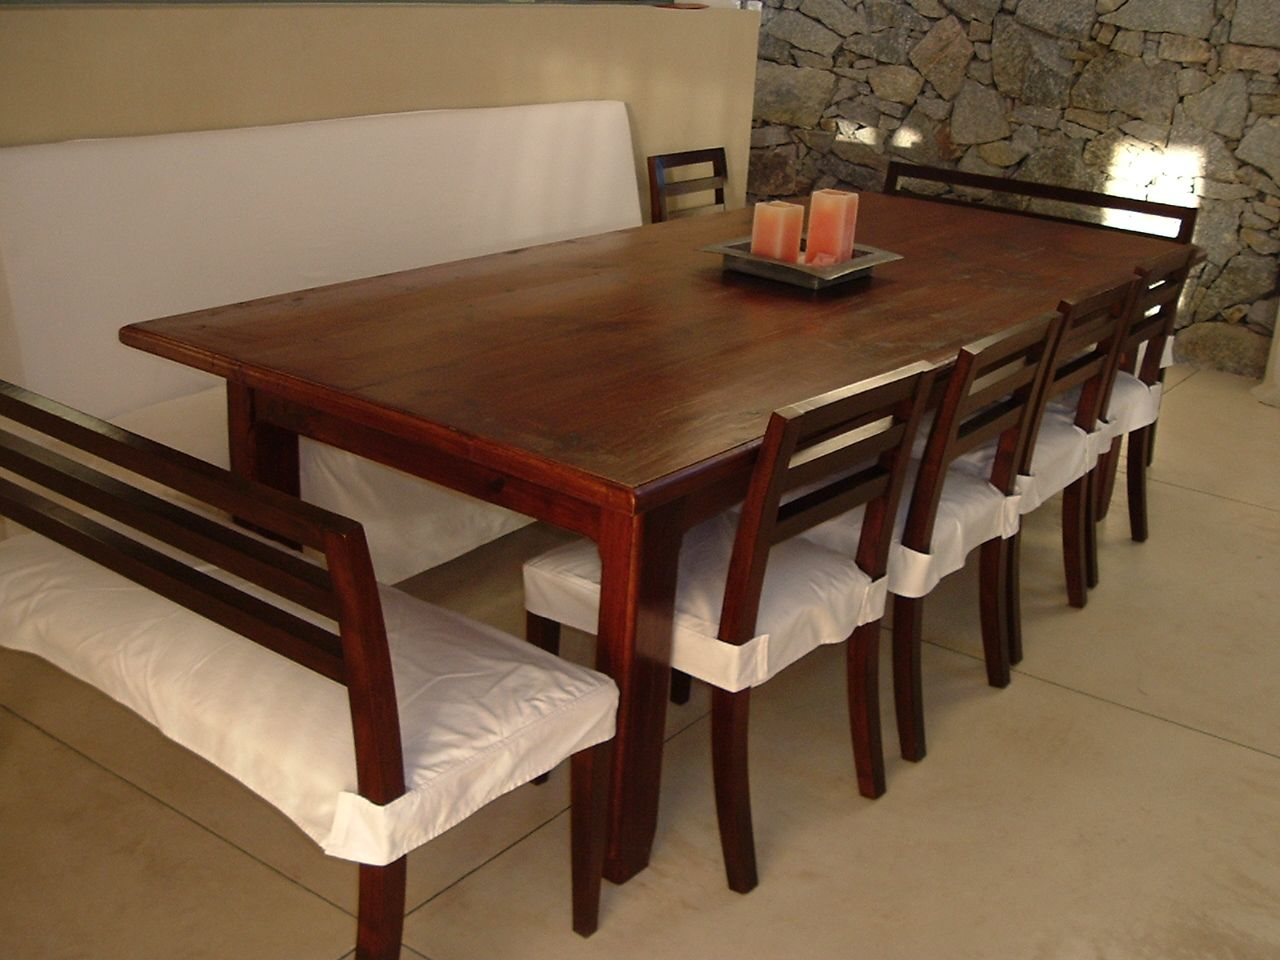 Espacio valenzuela mesa de comedor - Mesas redondas de comedor antiguas ...